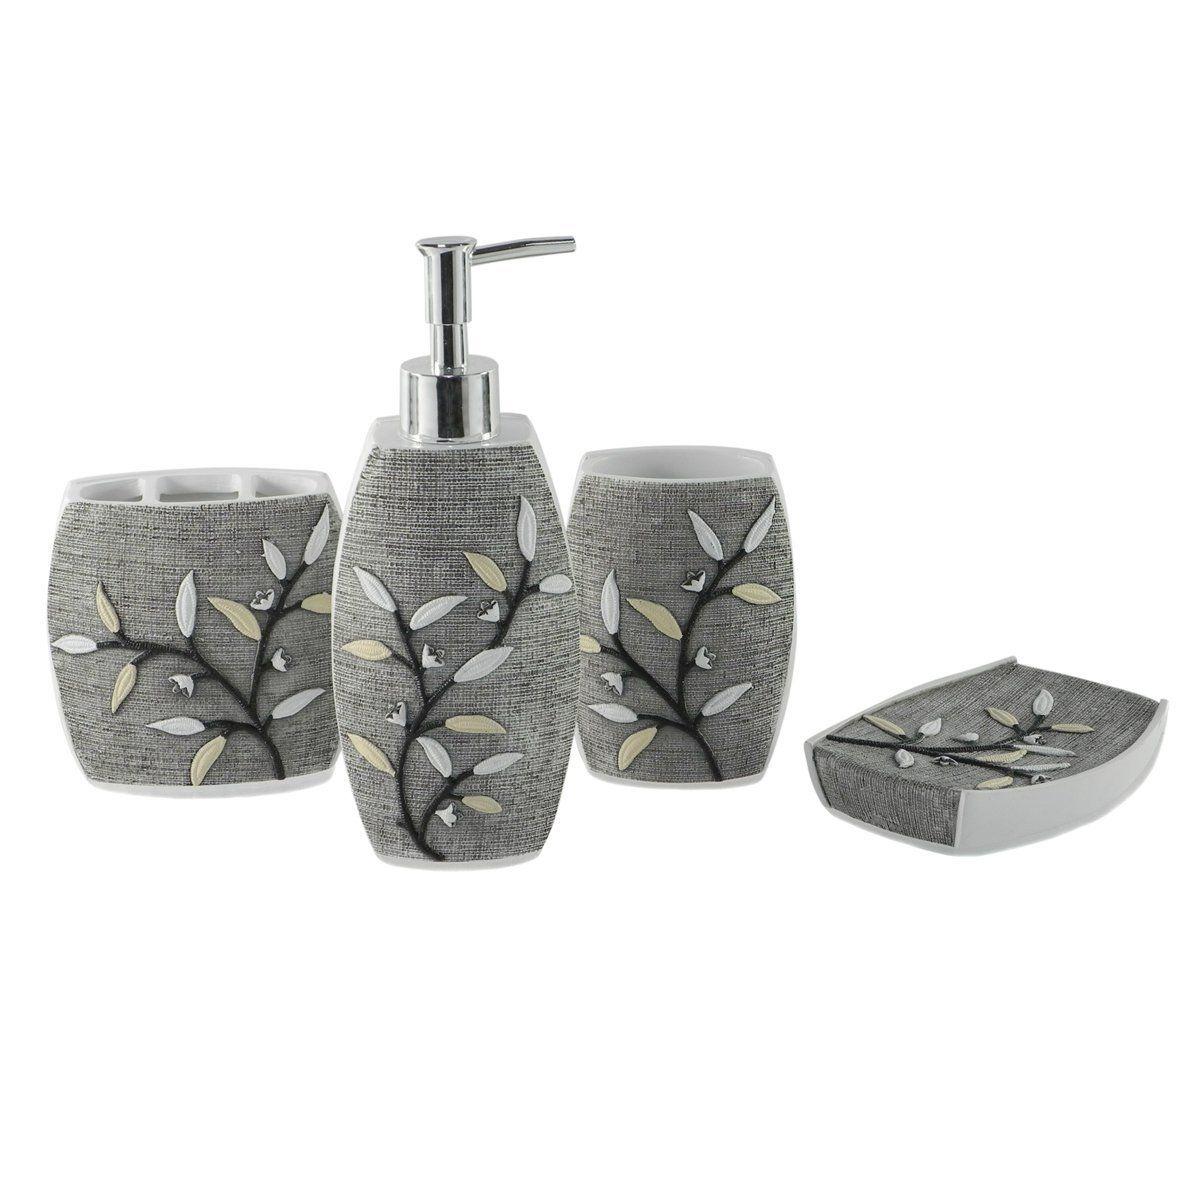 Ink Wonderland Bath Bathroom Accessories Set | Luxury bath, Bathroom ...